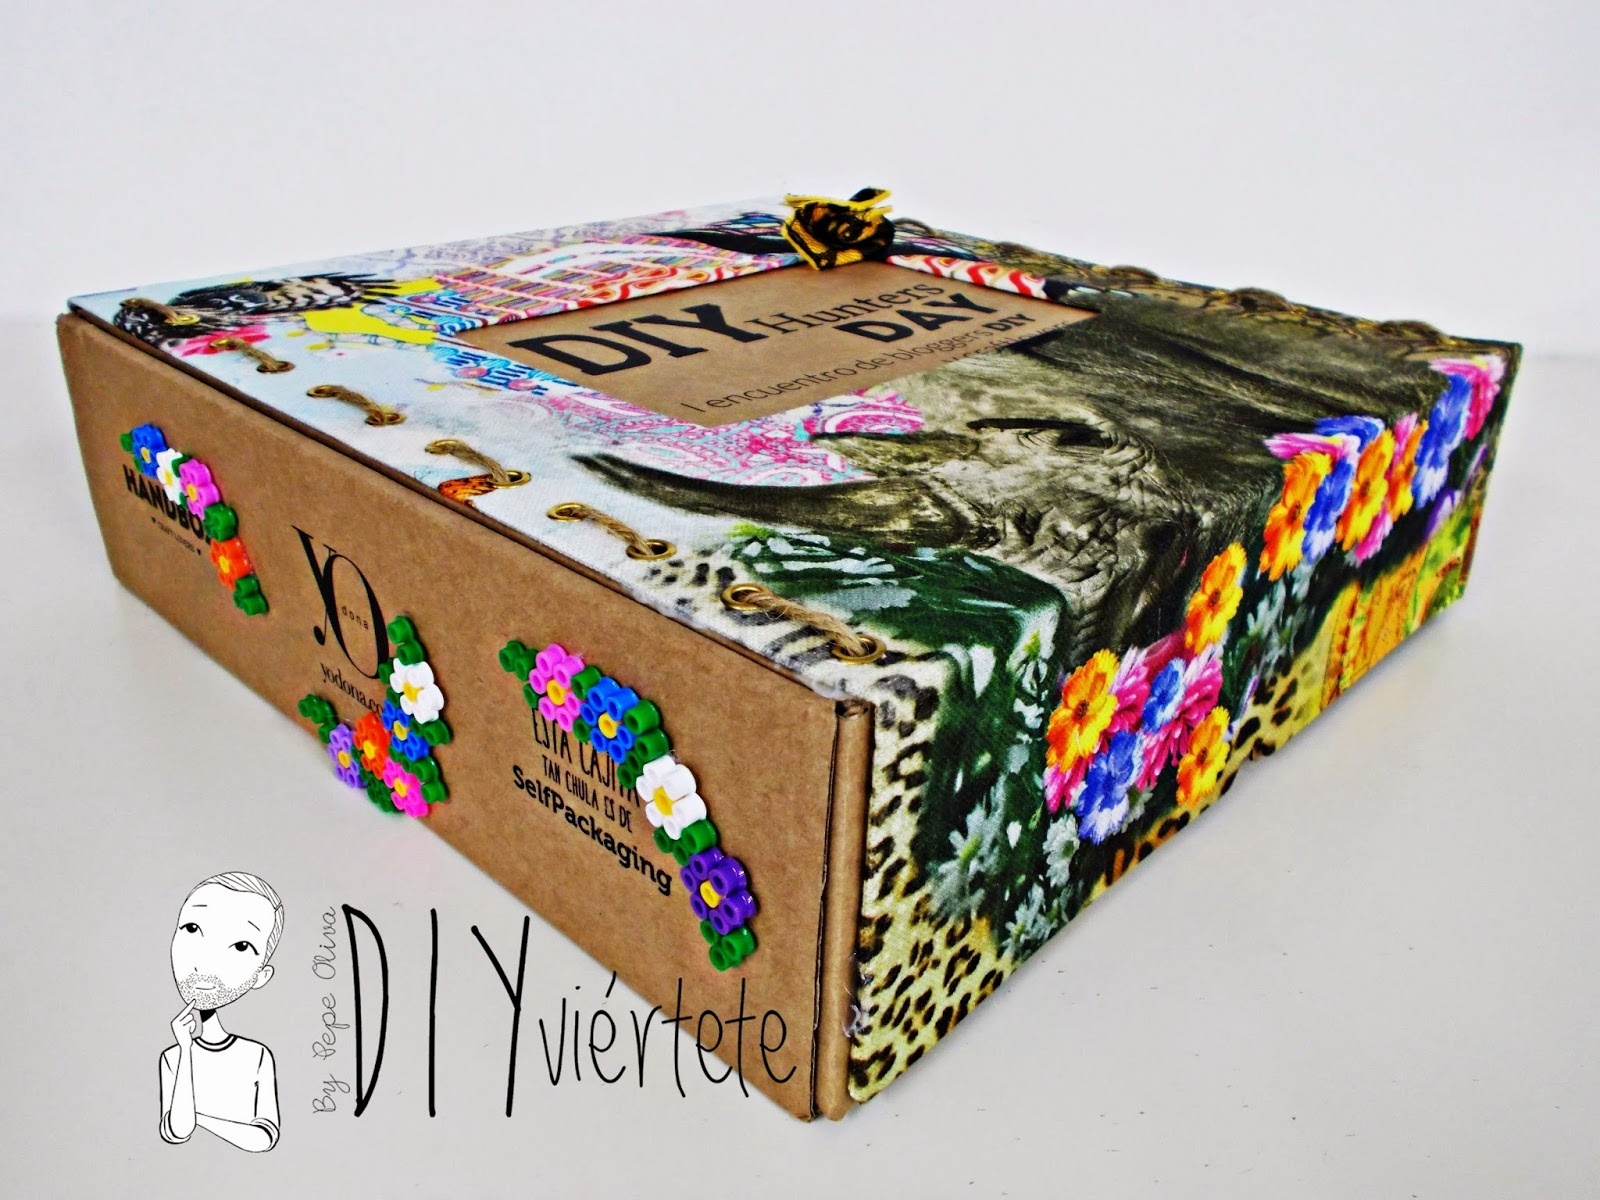 DIY-Do It Yourself-caja-cartón-selfpackaging-customizar-handbox-yodona-diyhuntersday-craftlovers-2